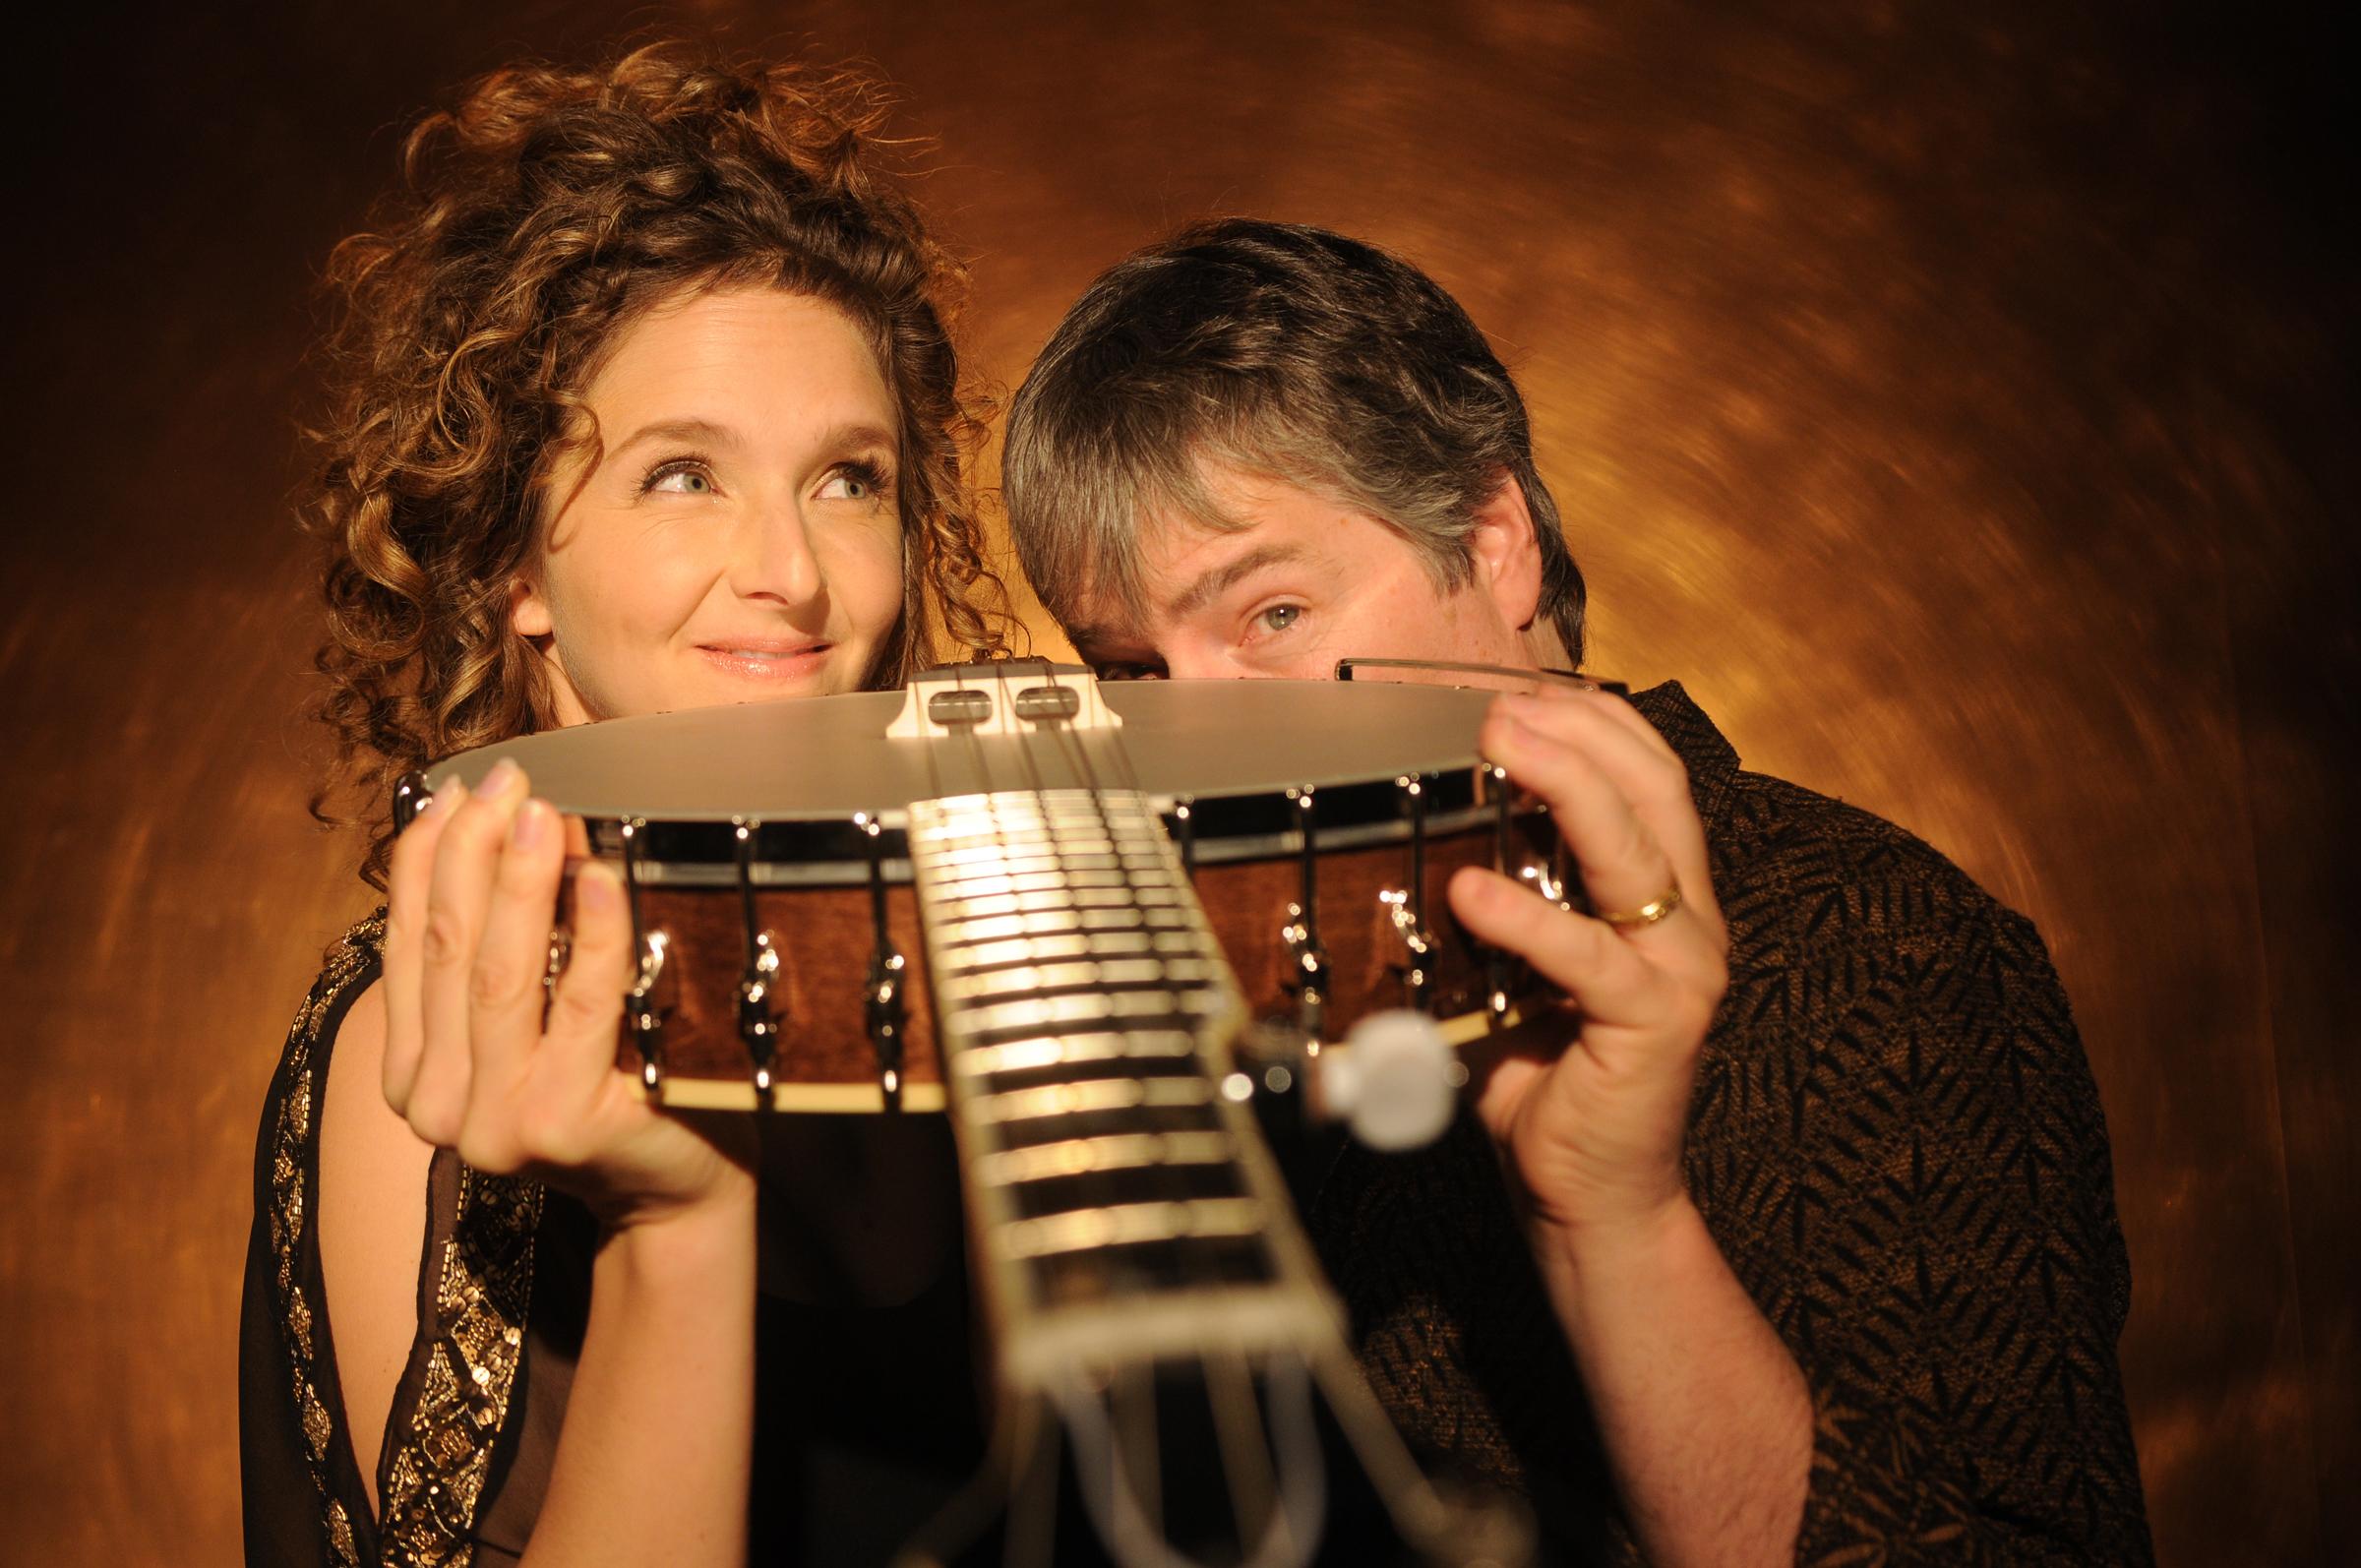 Bela Fleck & Abigail Washburn. Photo by Jim McGuire